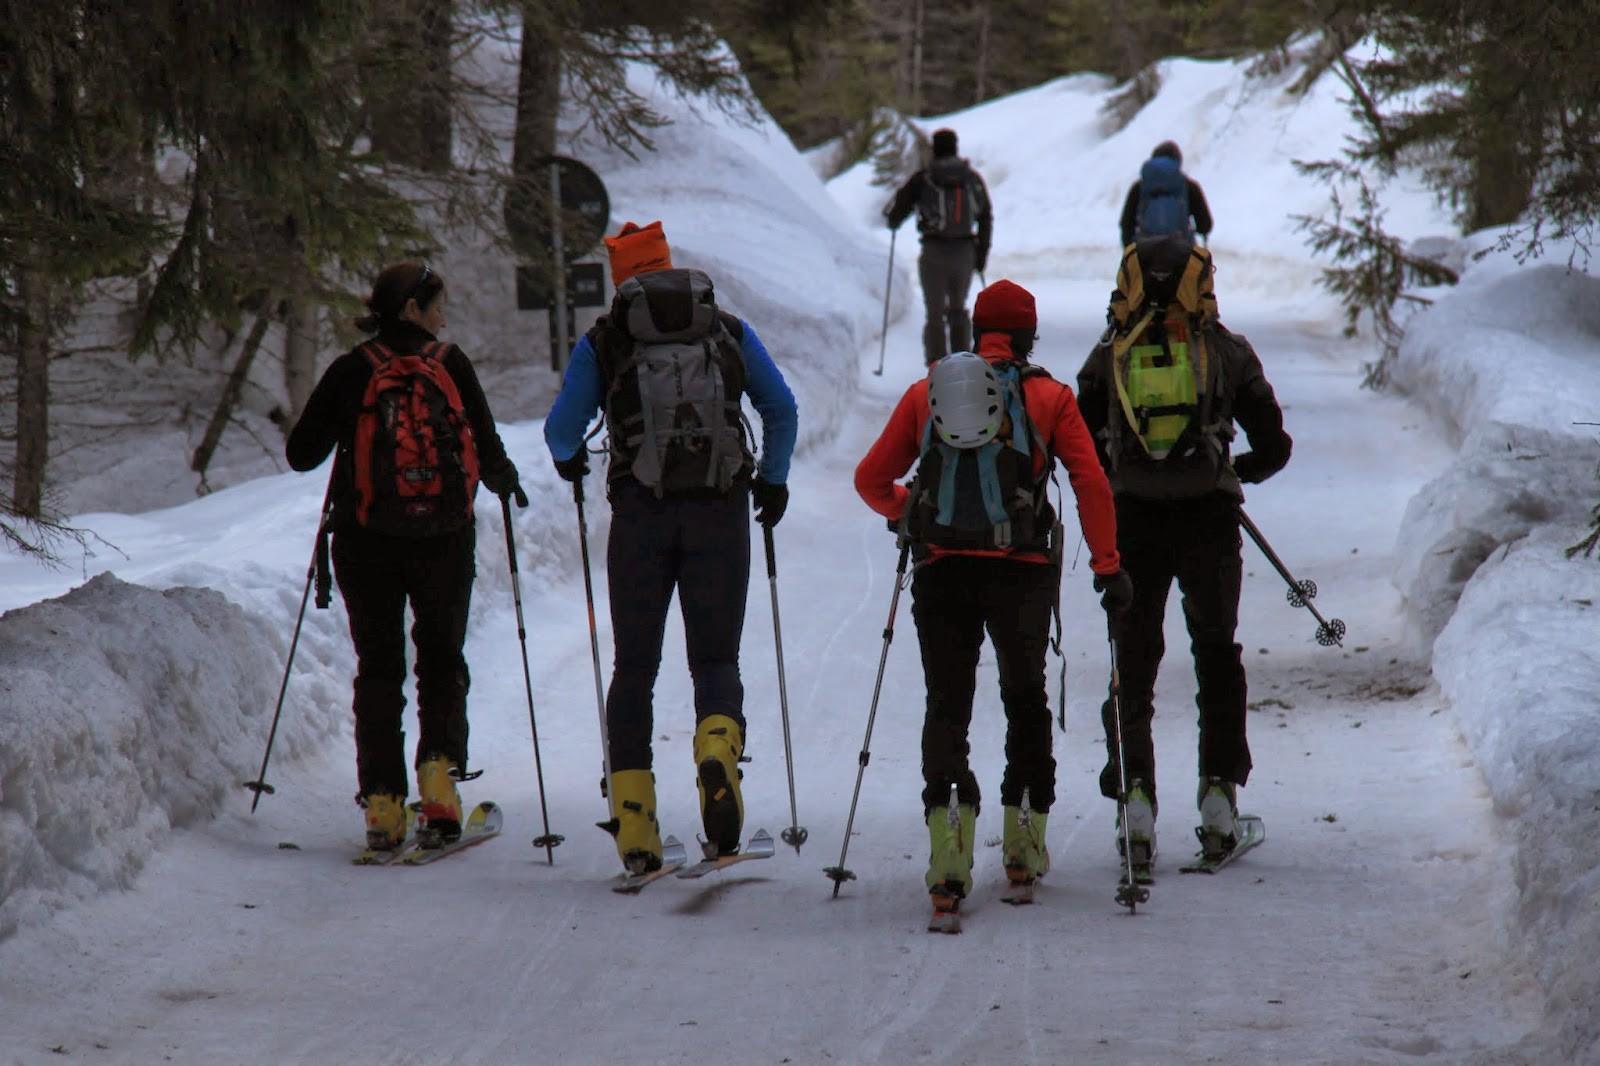 Cima Piatta Alta (Hochebenkofel) 2905 m – Scialpinismo in Valpusteria 2/3